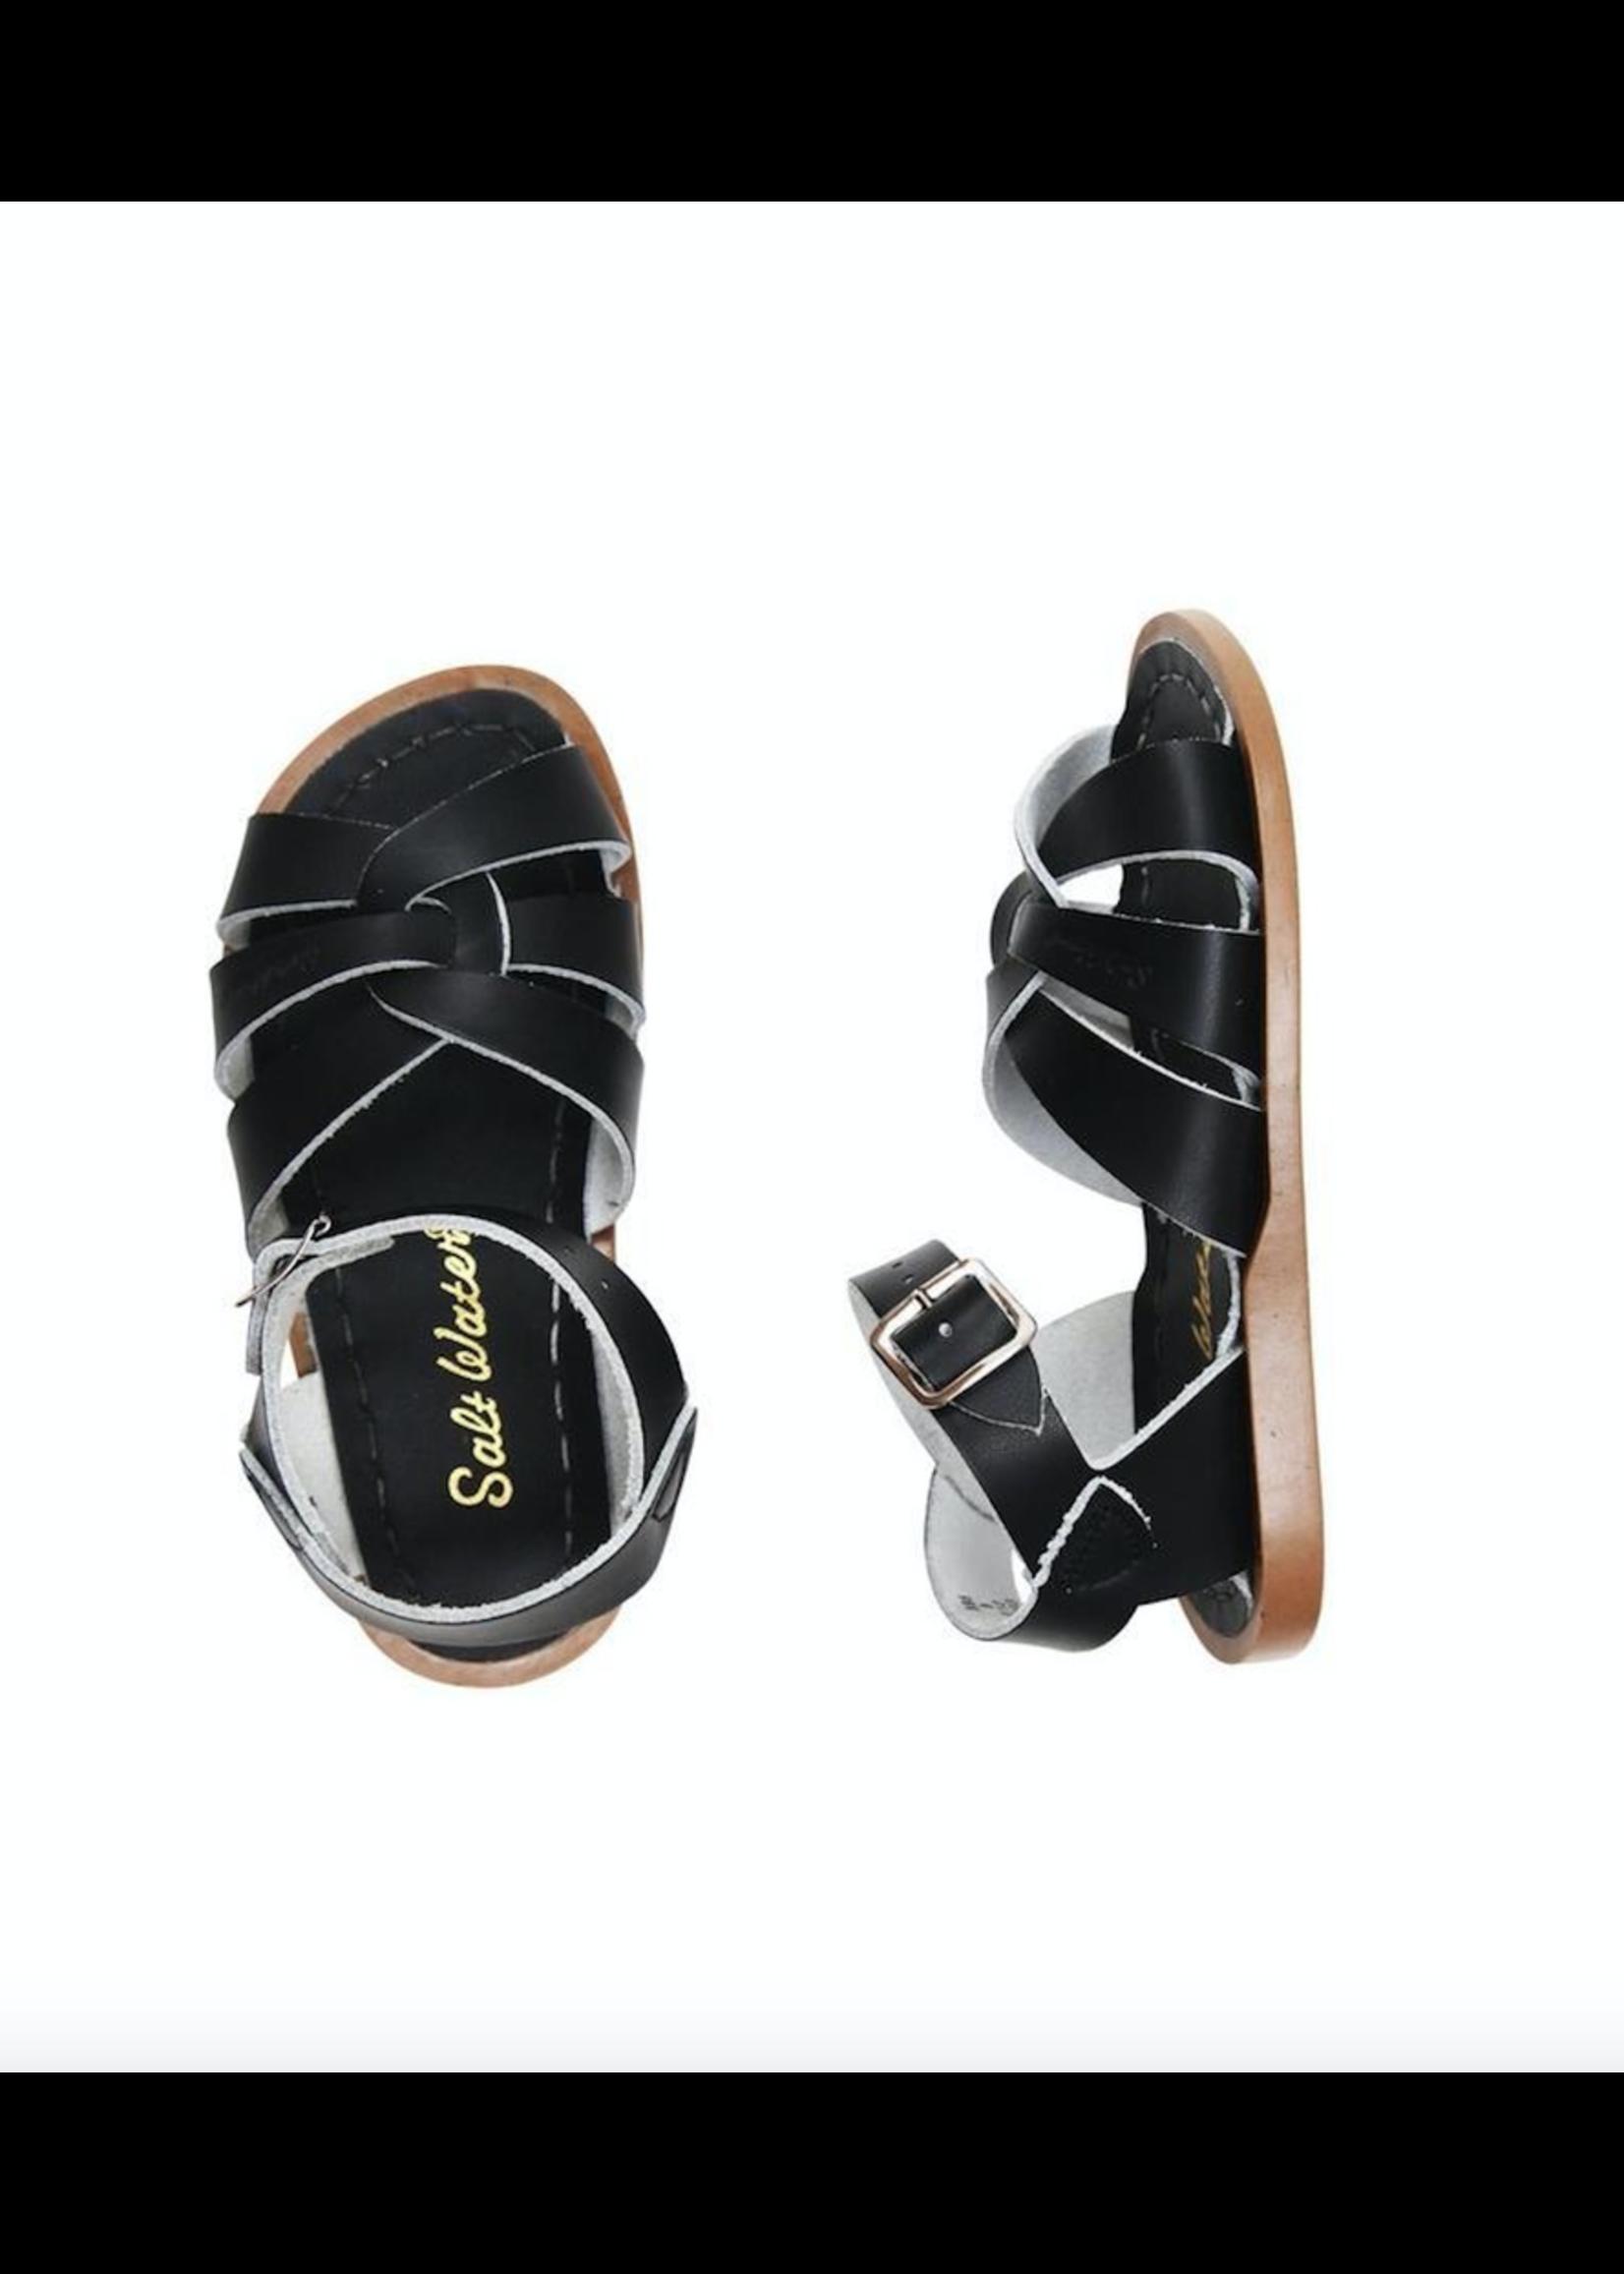 Salt Water Sandals Salt Water Sandal, Original, Adult